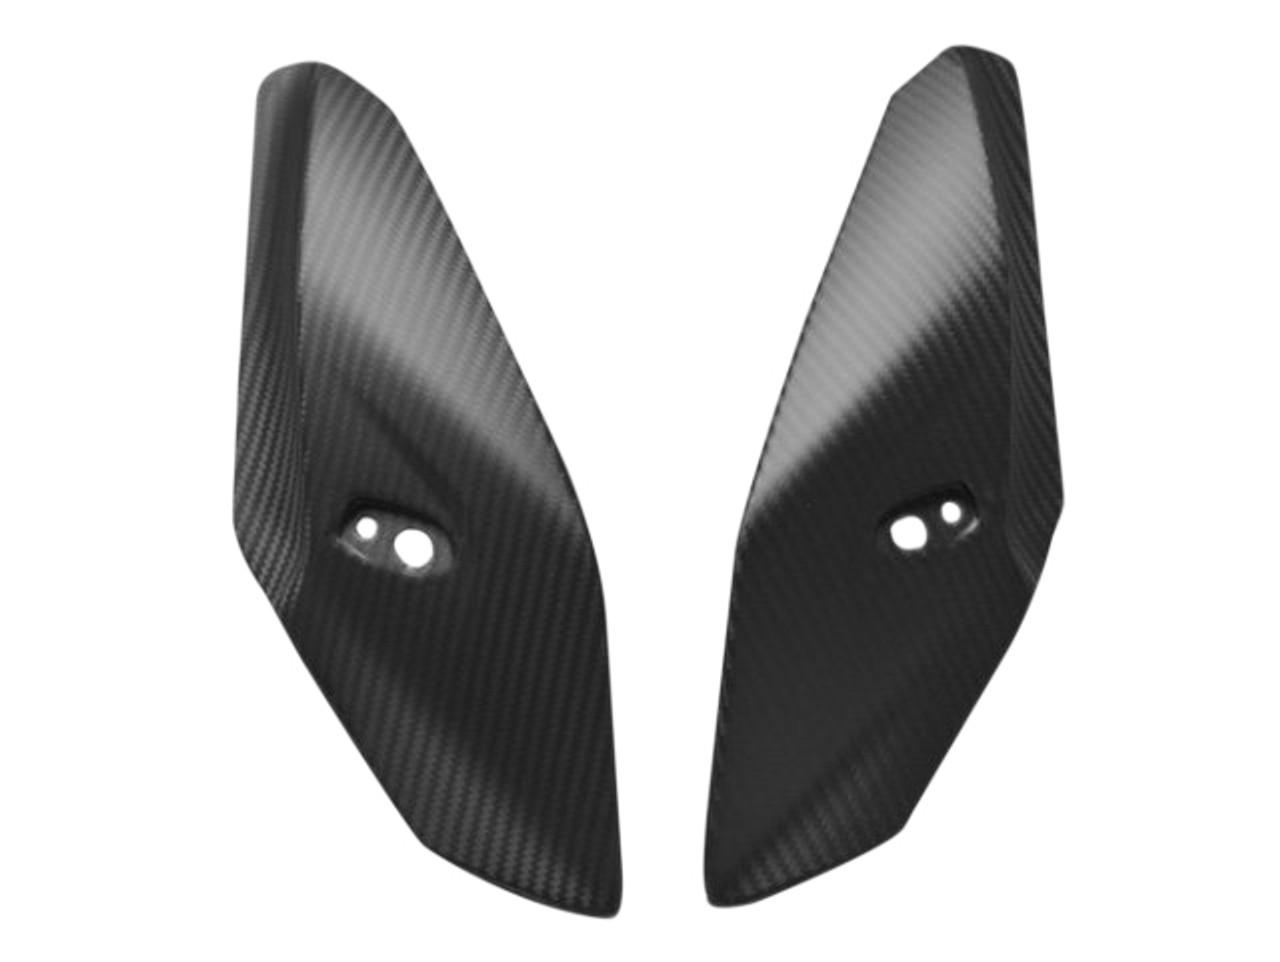 Upper Fairing Sides in Matte Twill Weave Carbon Fiber for BMW S1000R 2014+